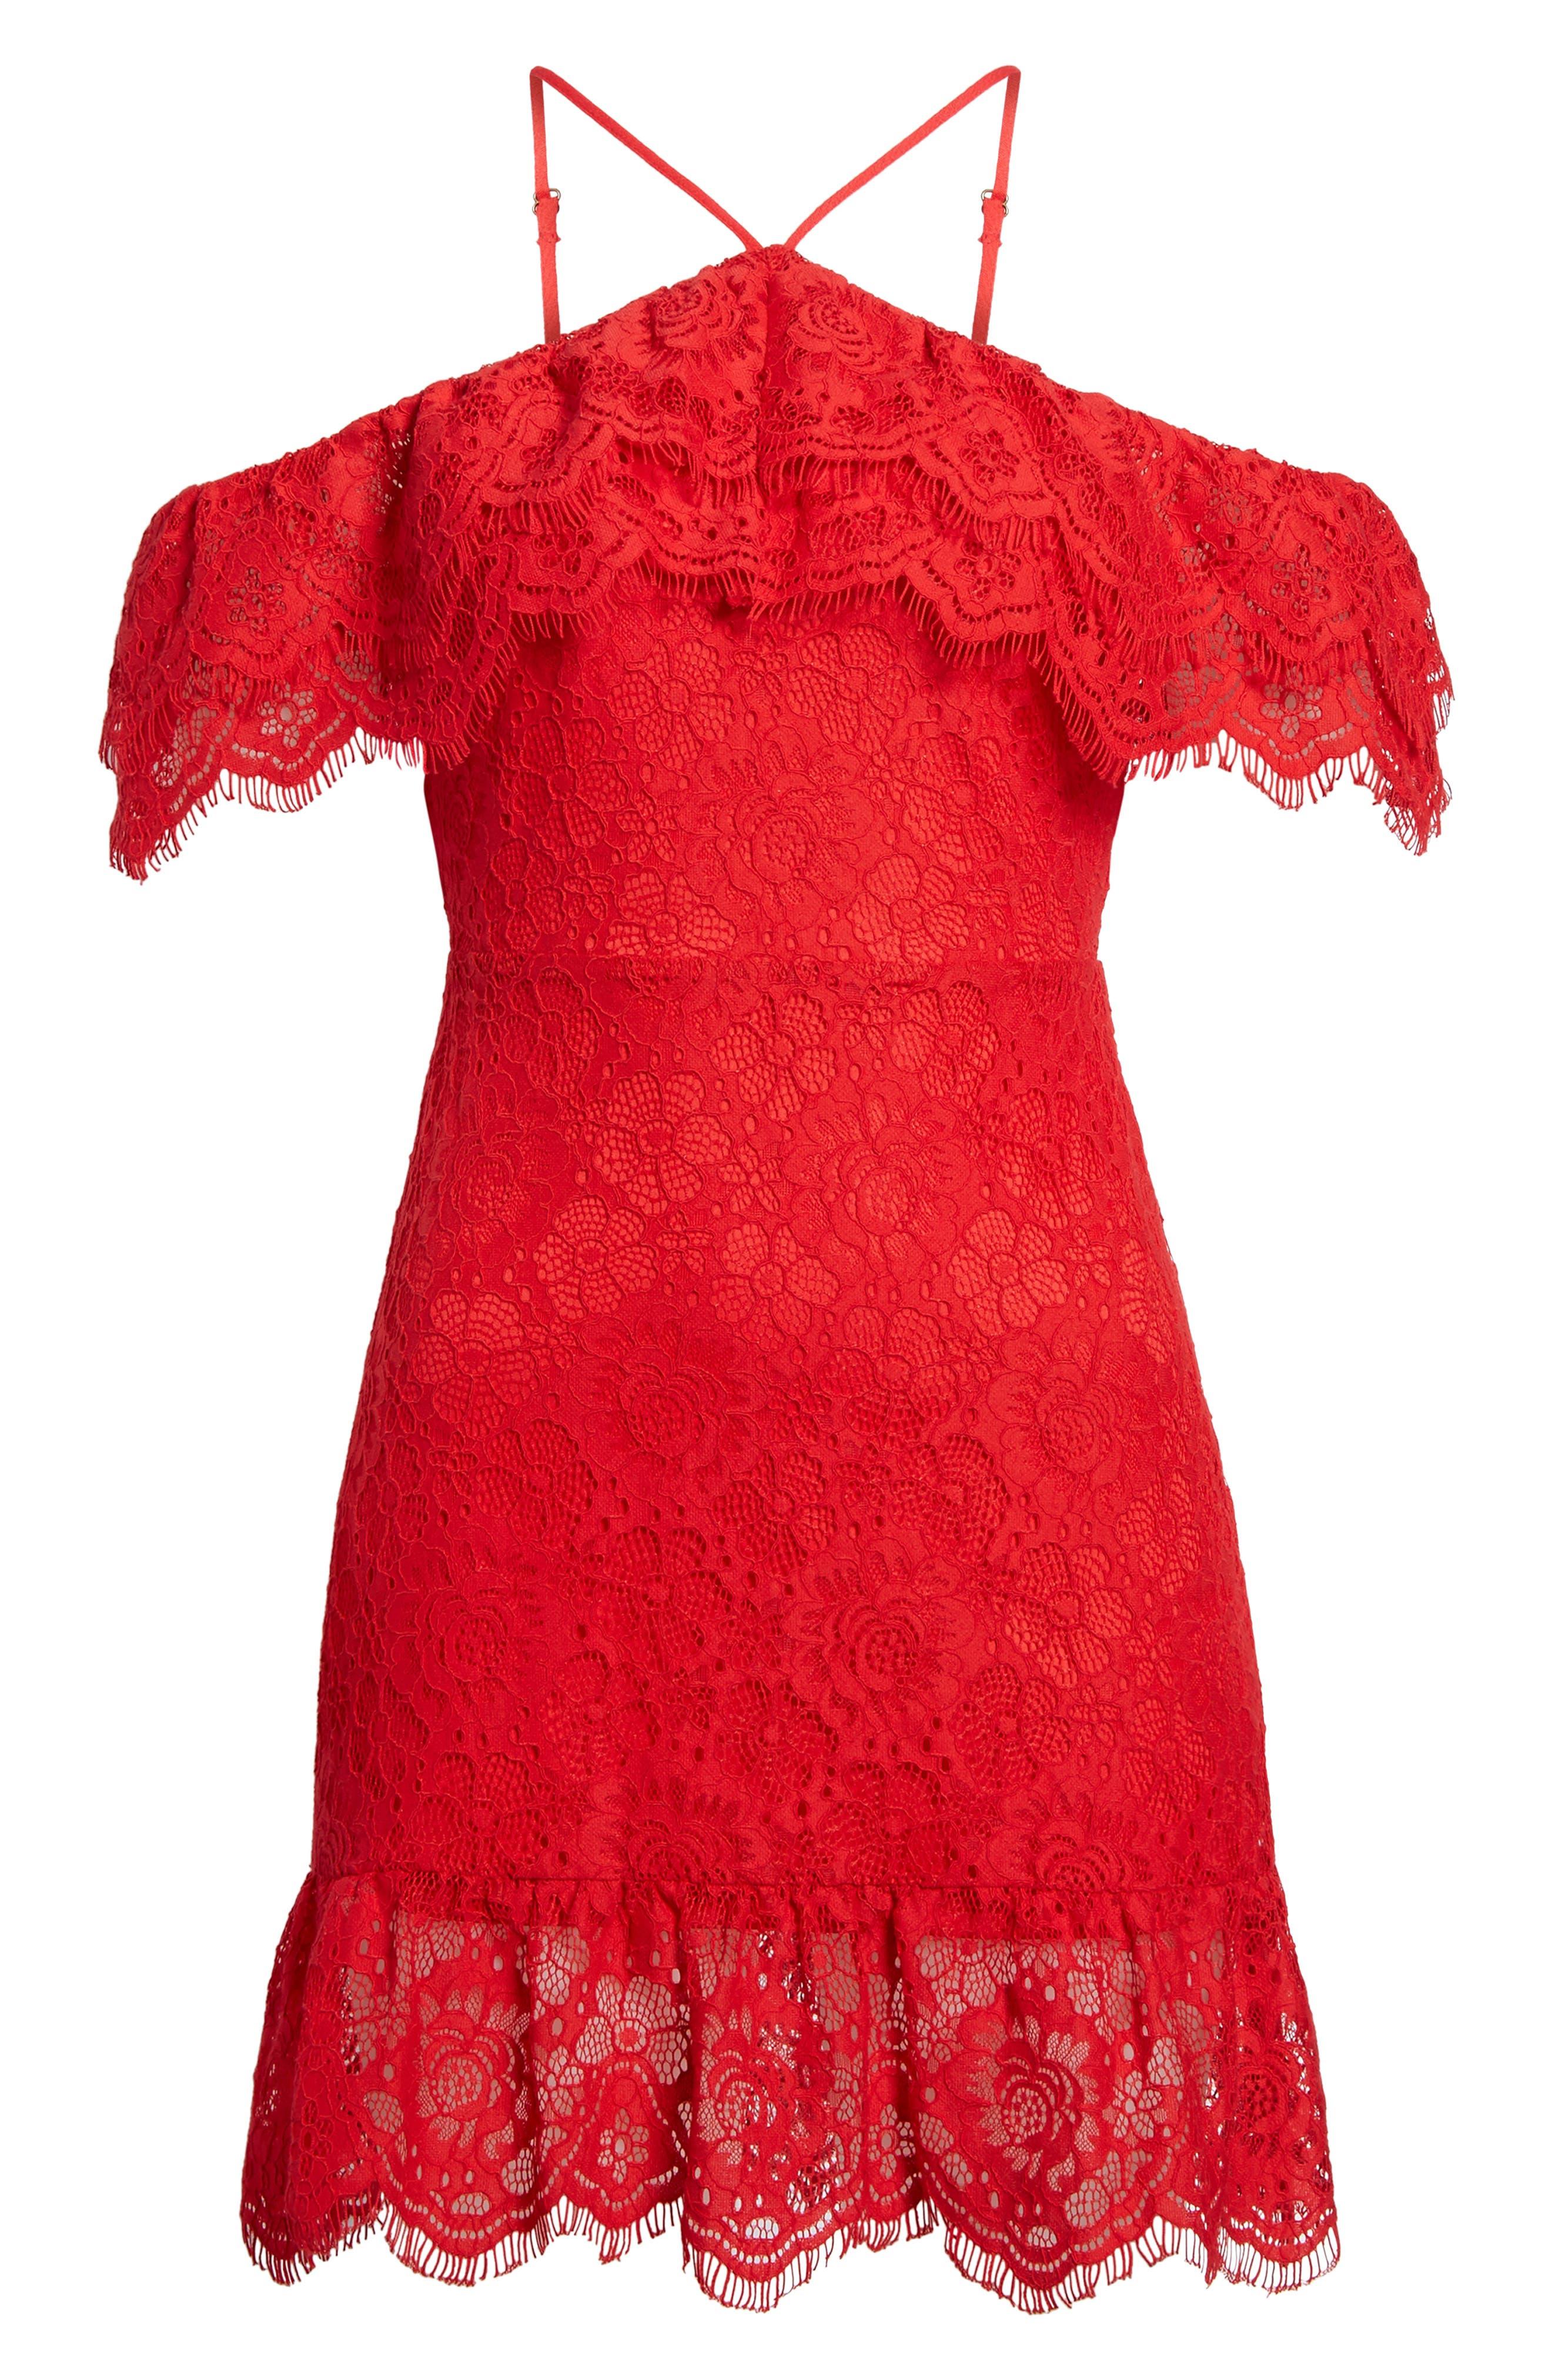 L'Amour Ruffle Halter Dress,                             Alternate thumbnail 6, color,                             600